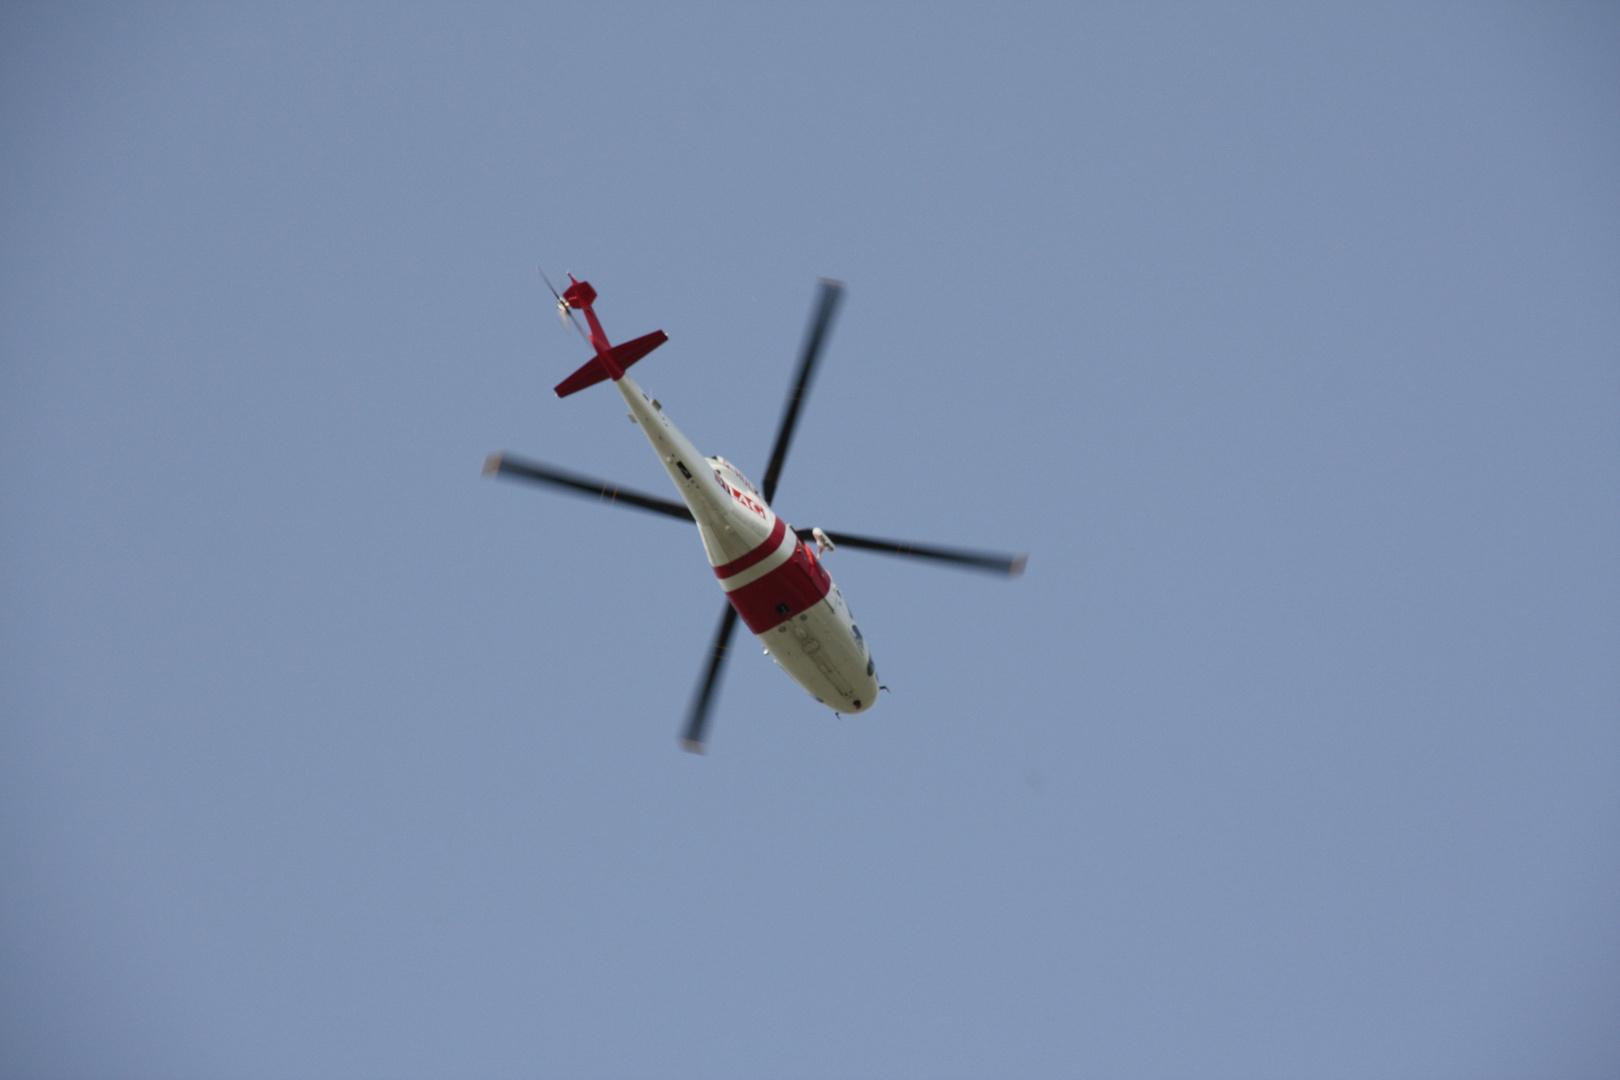 Sikorsky D-HULK S-76 A